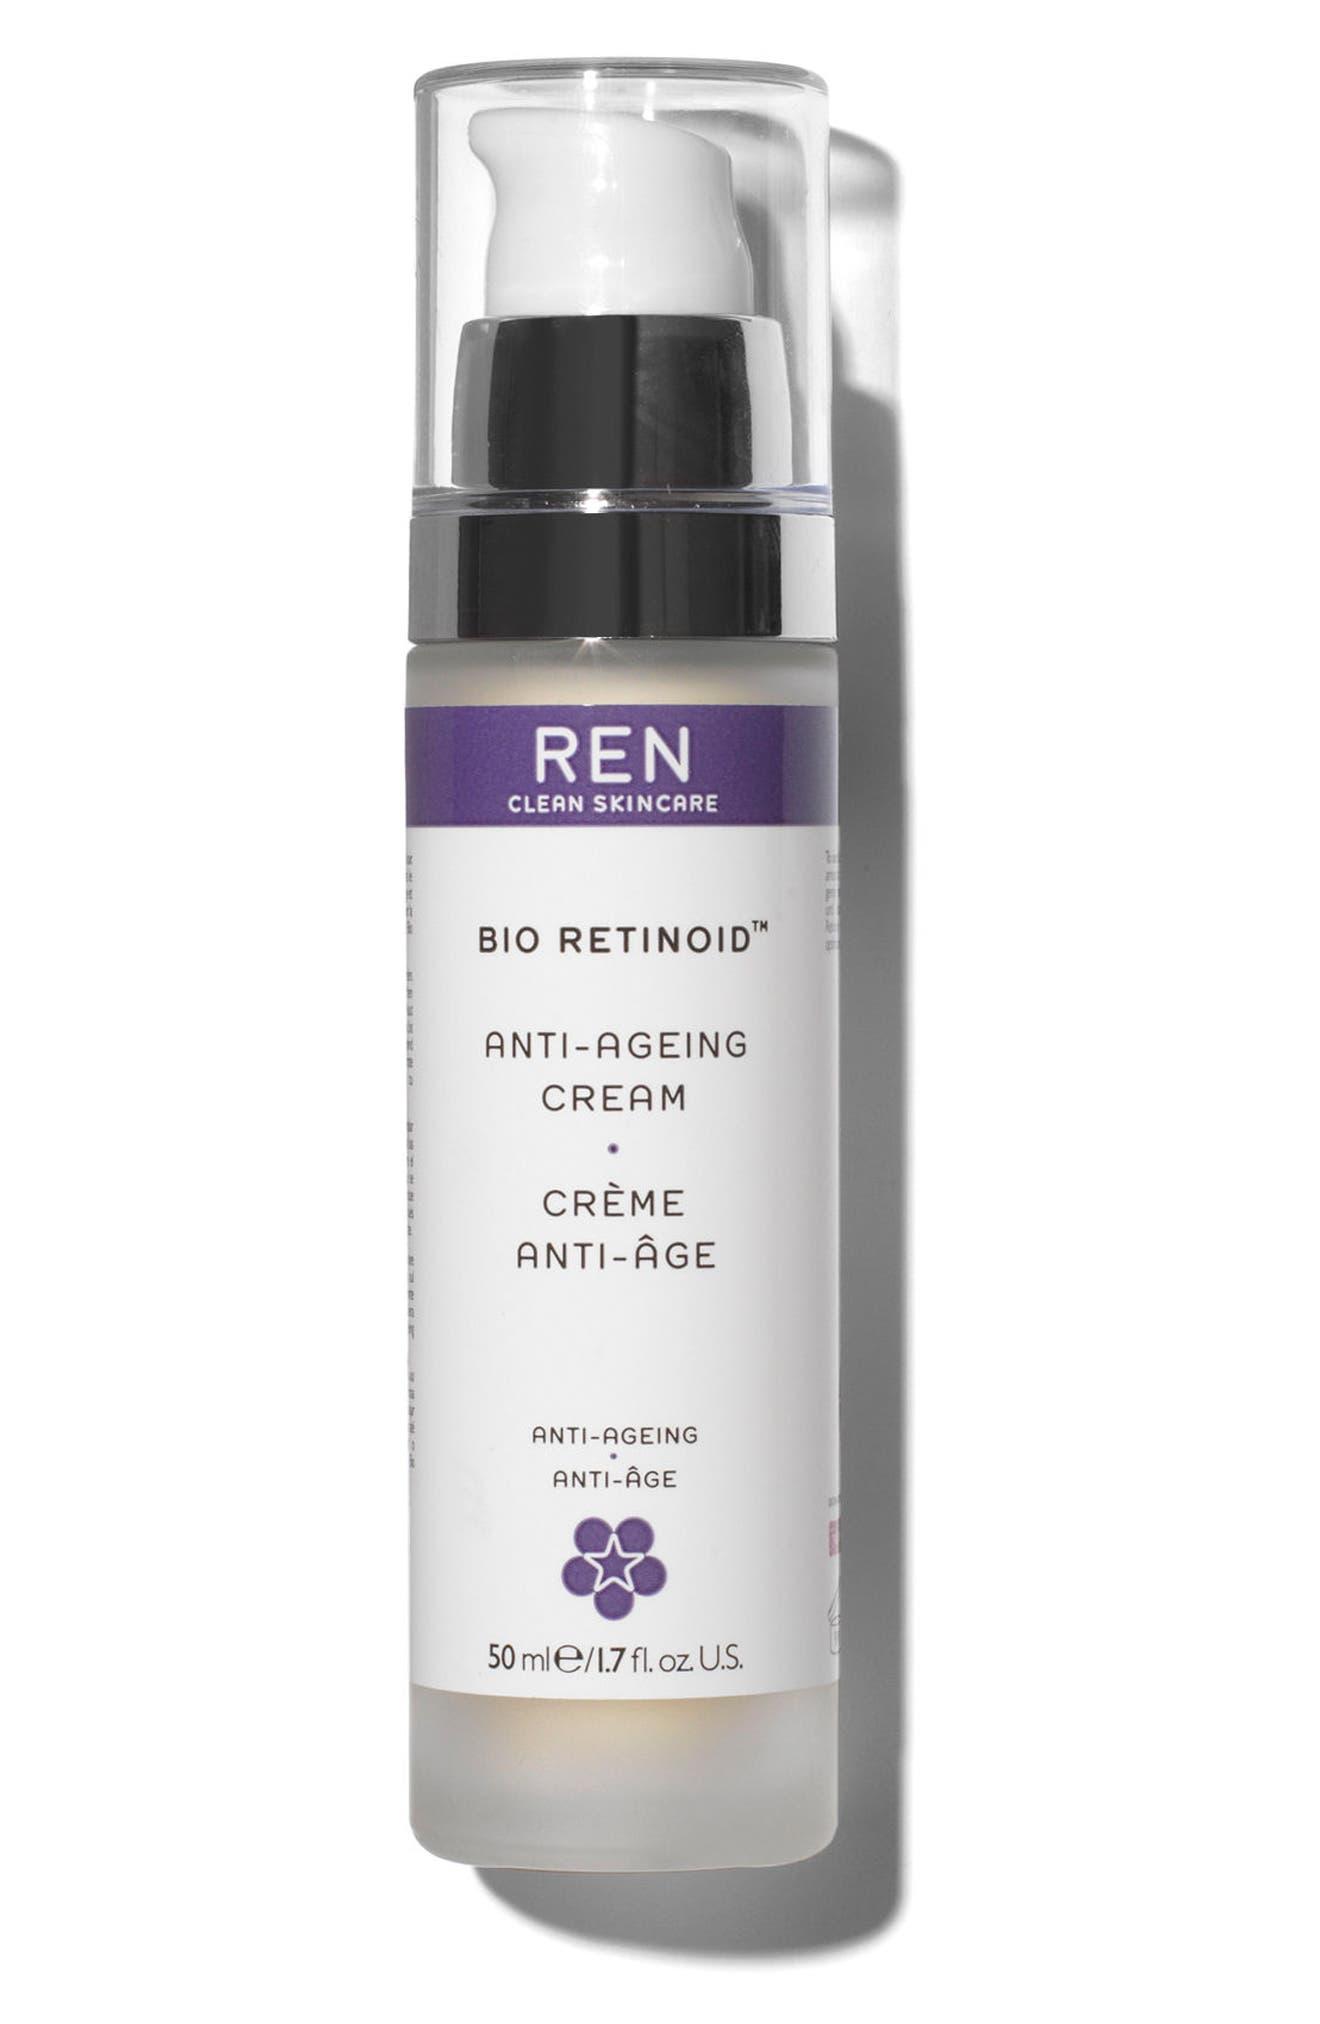 Alternate Image 1 Selected - SPACE.NK.apothecary REN Bio Retinoid Anti-Aging Cream